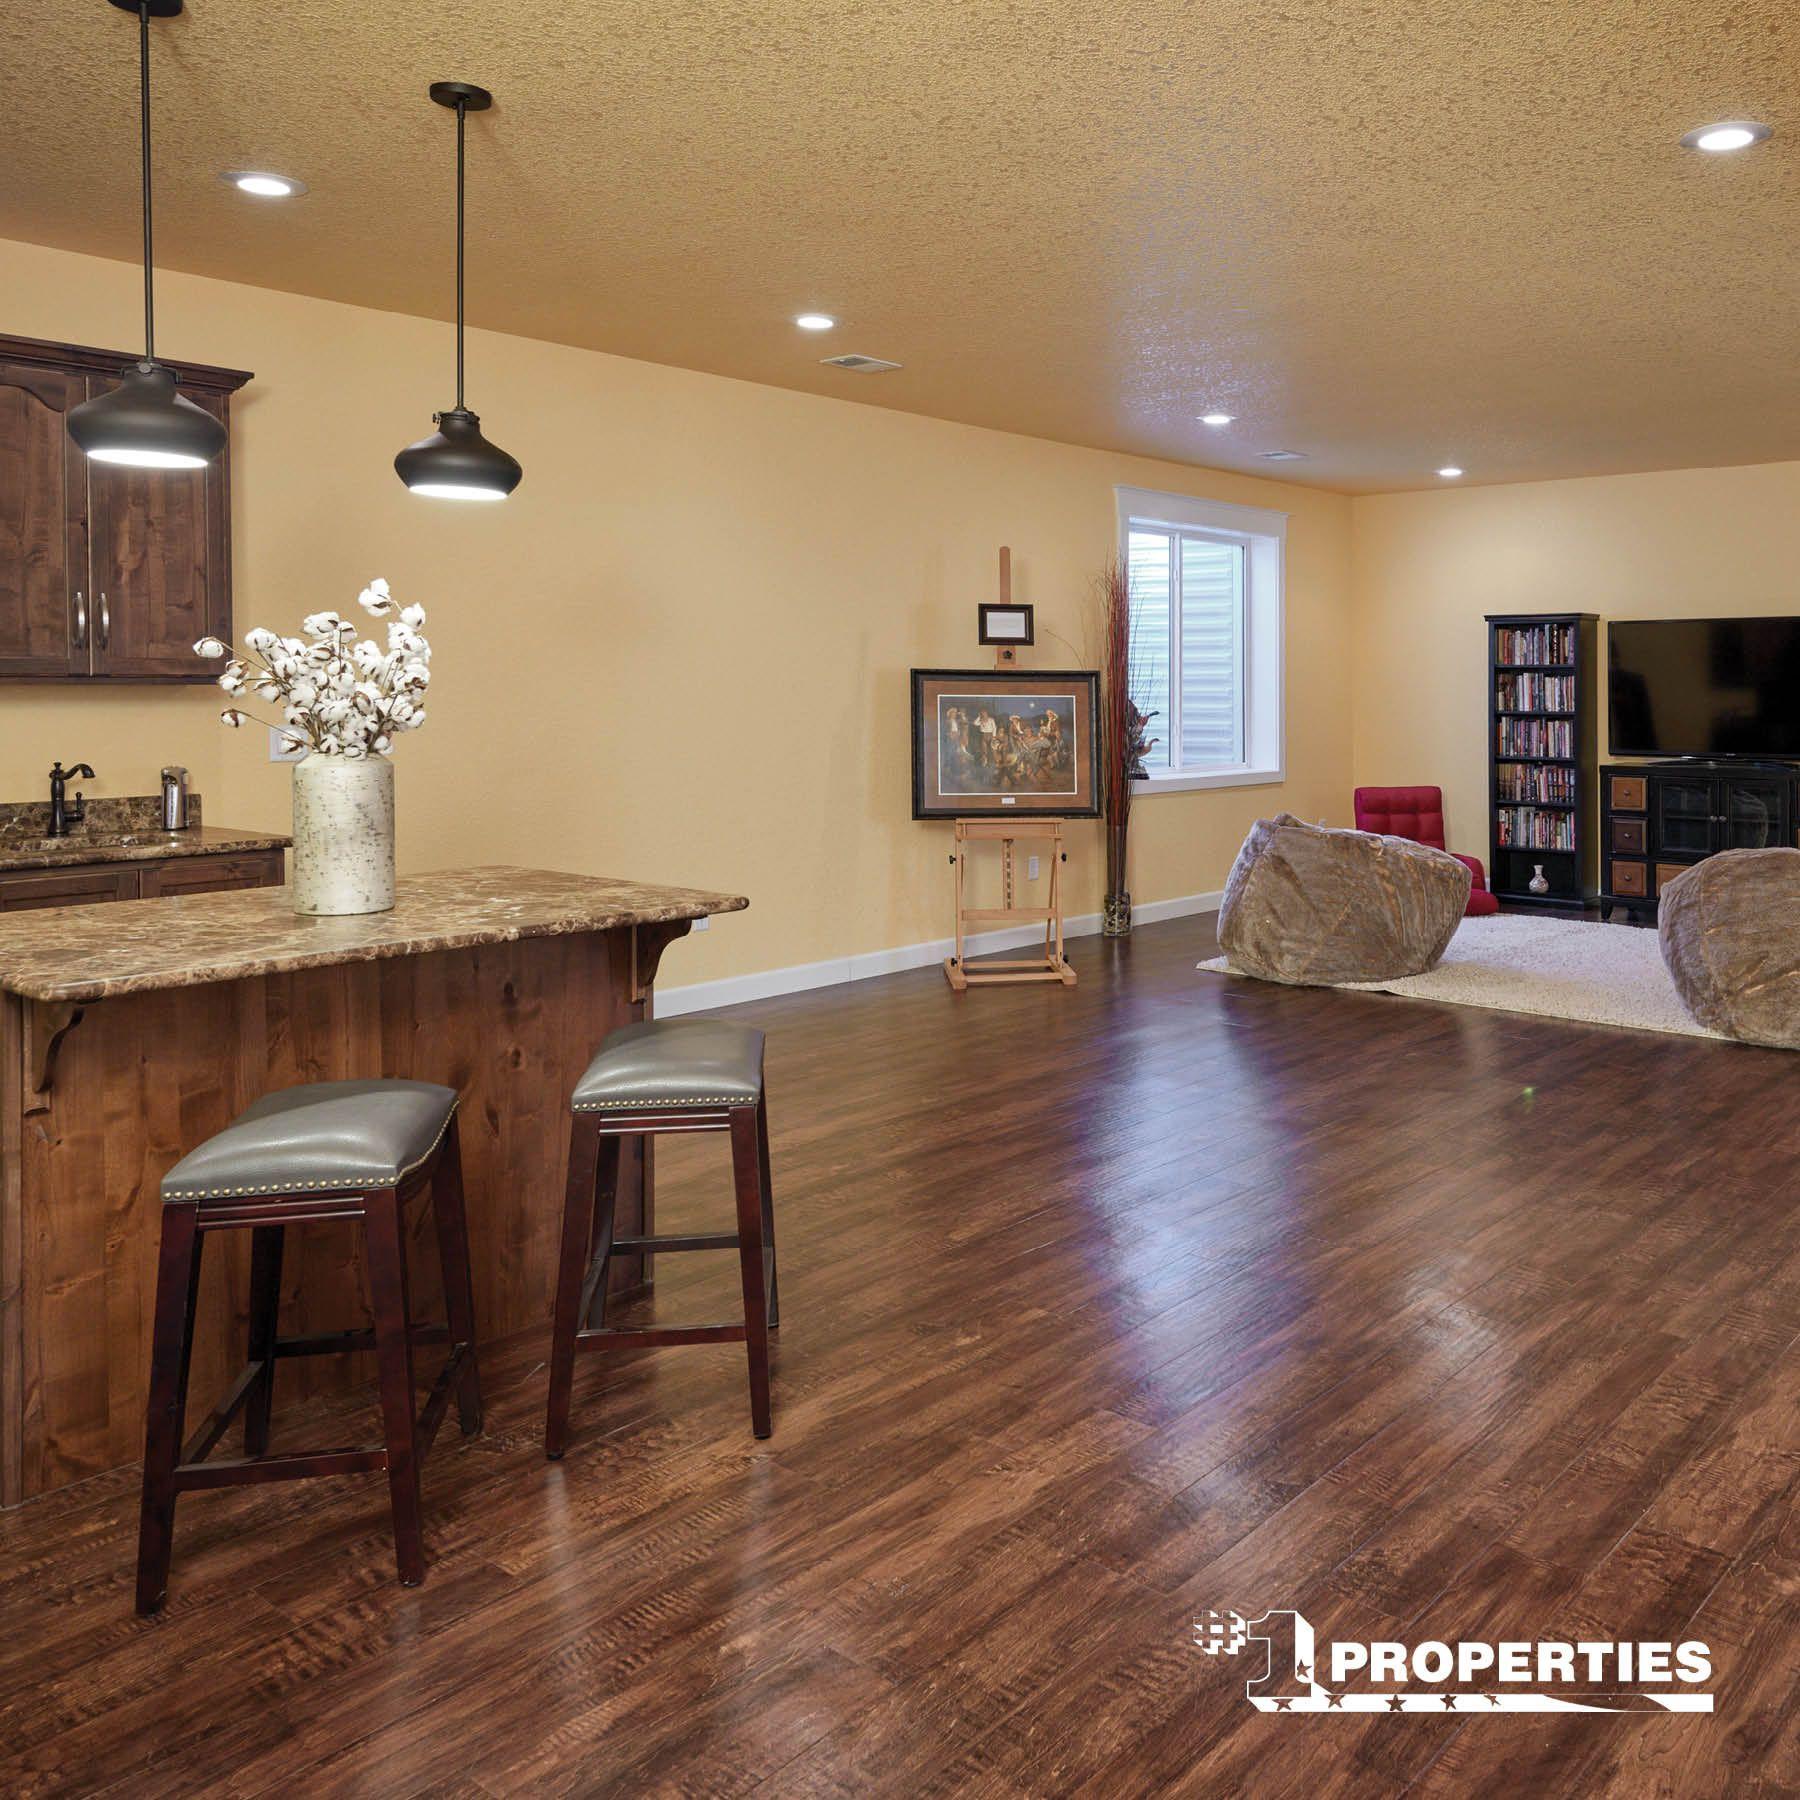 Custom Builder Basement Finish 2346 Council Bluff Cheyenne Wyoming Cheyennehomes Realestate Househunting Realty Home Finishing Basement Custom Builder